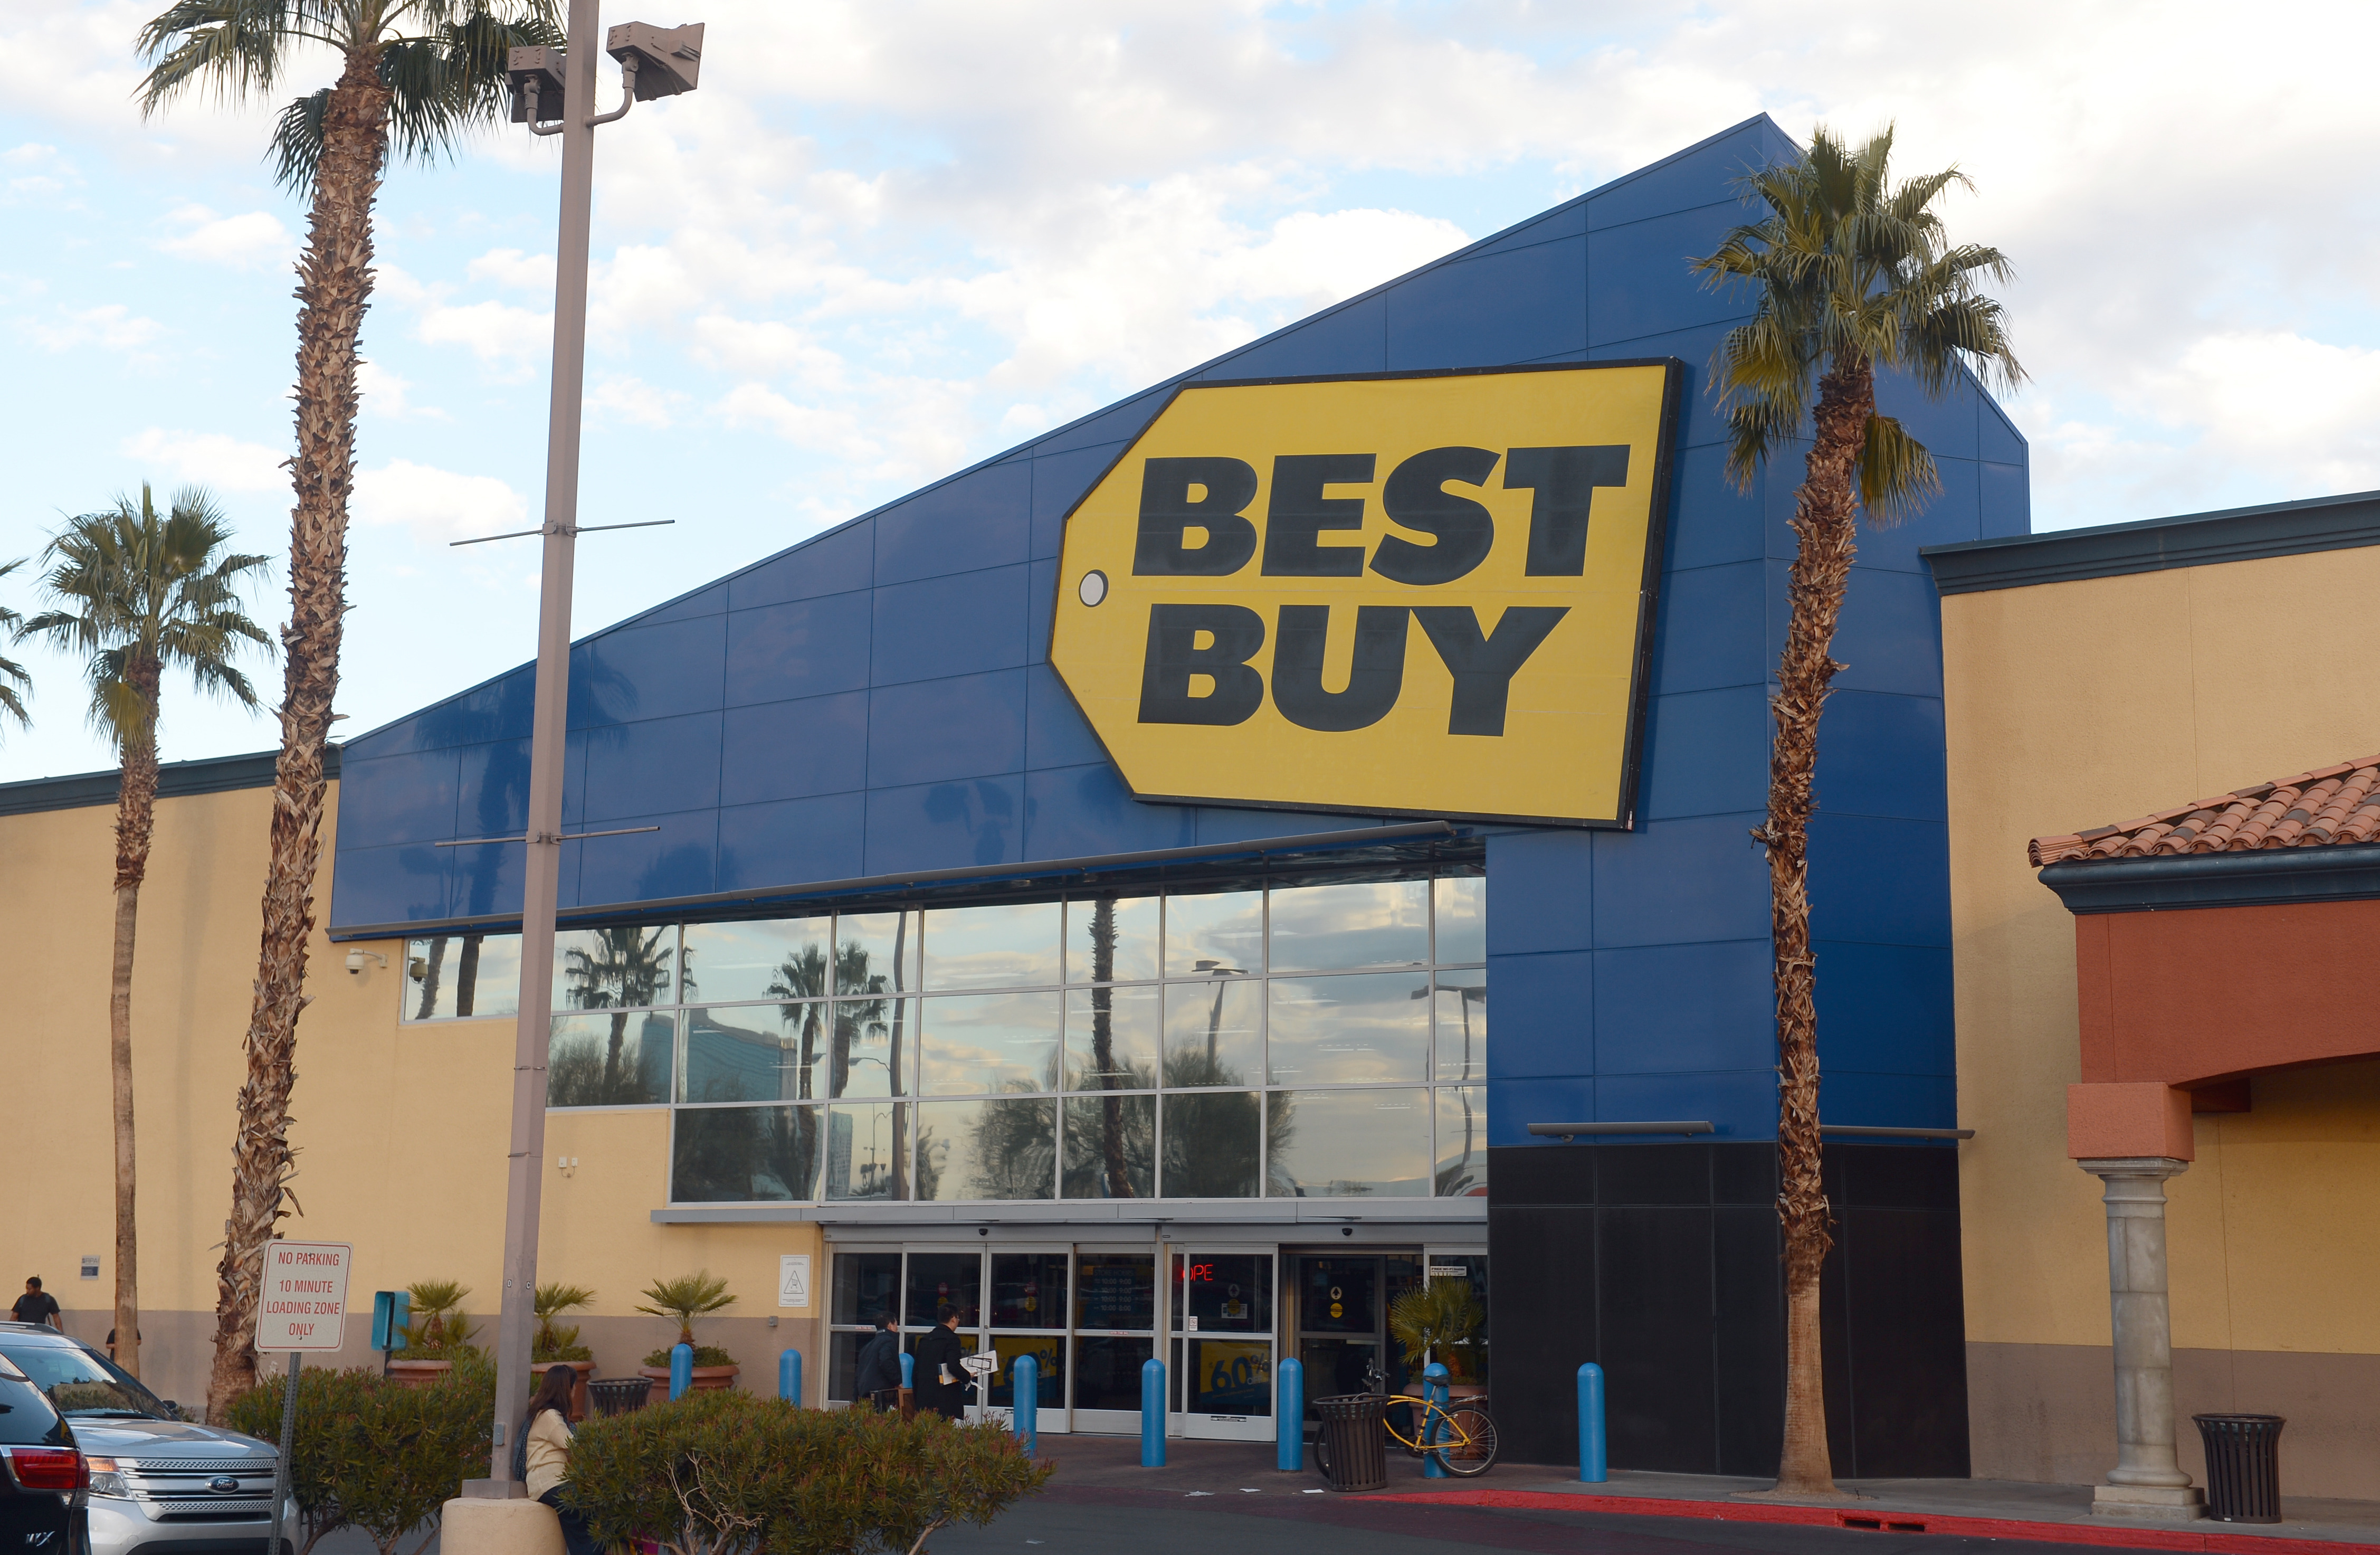 A Best Buy store in Las Vagas.